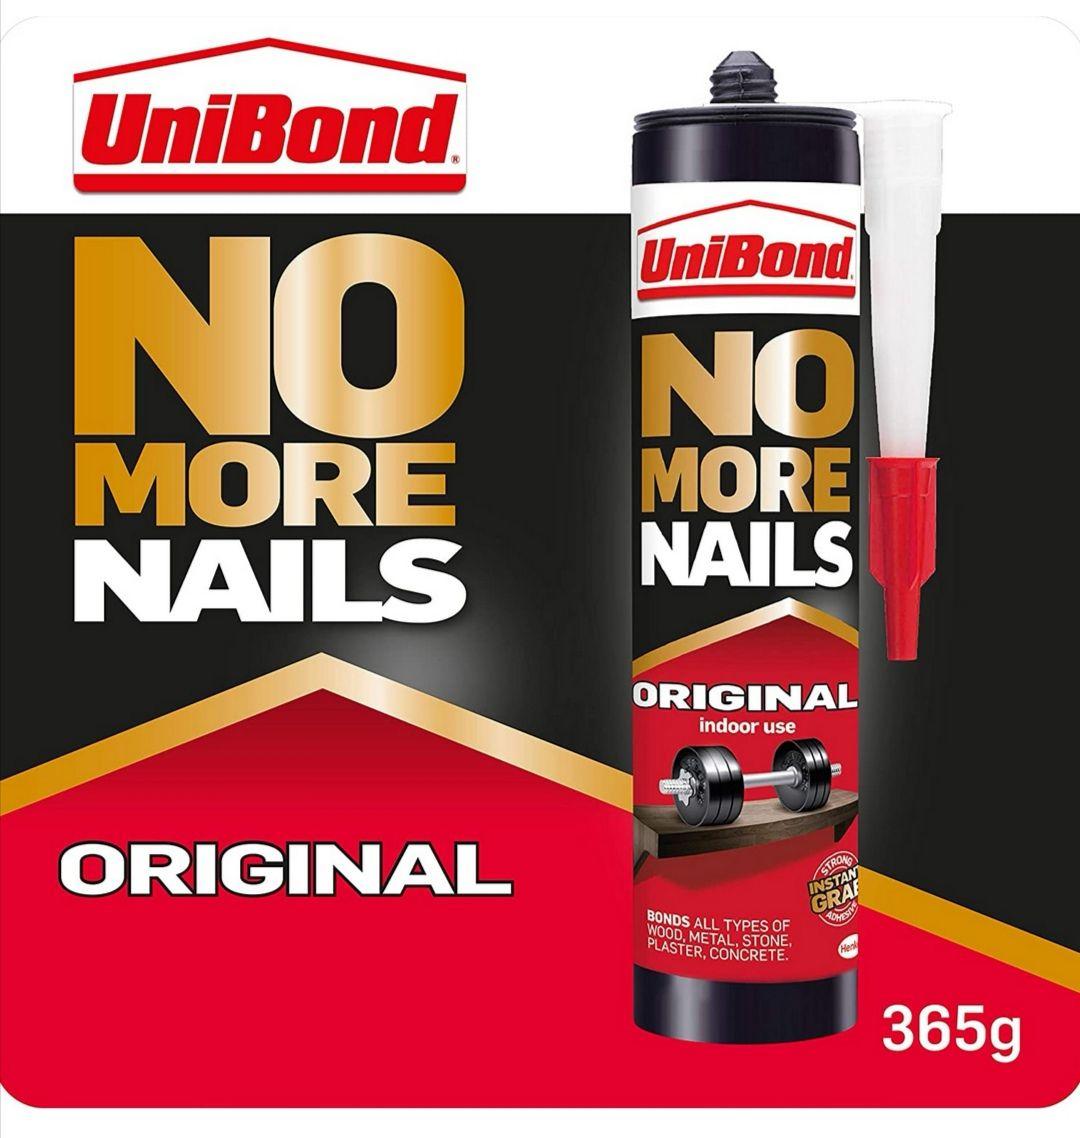 UniBond No More Nails Original, Heavy-Duty Mounting Adhesive, 1 x 365g Cartridge - £3.50 Prime / +4.49 Non Prime @ Amazon